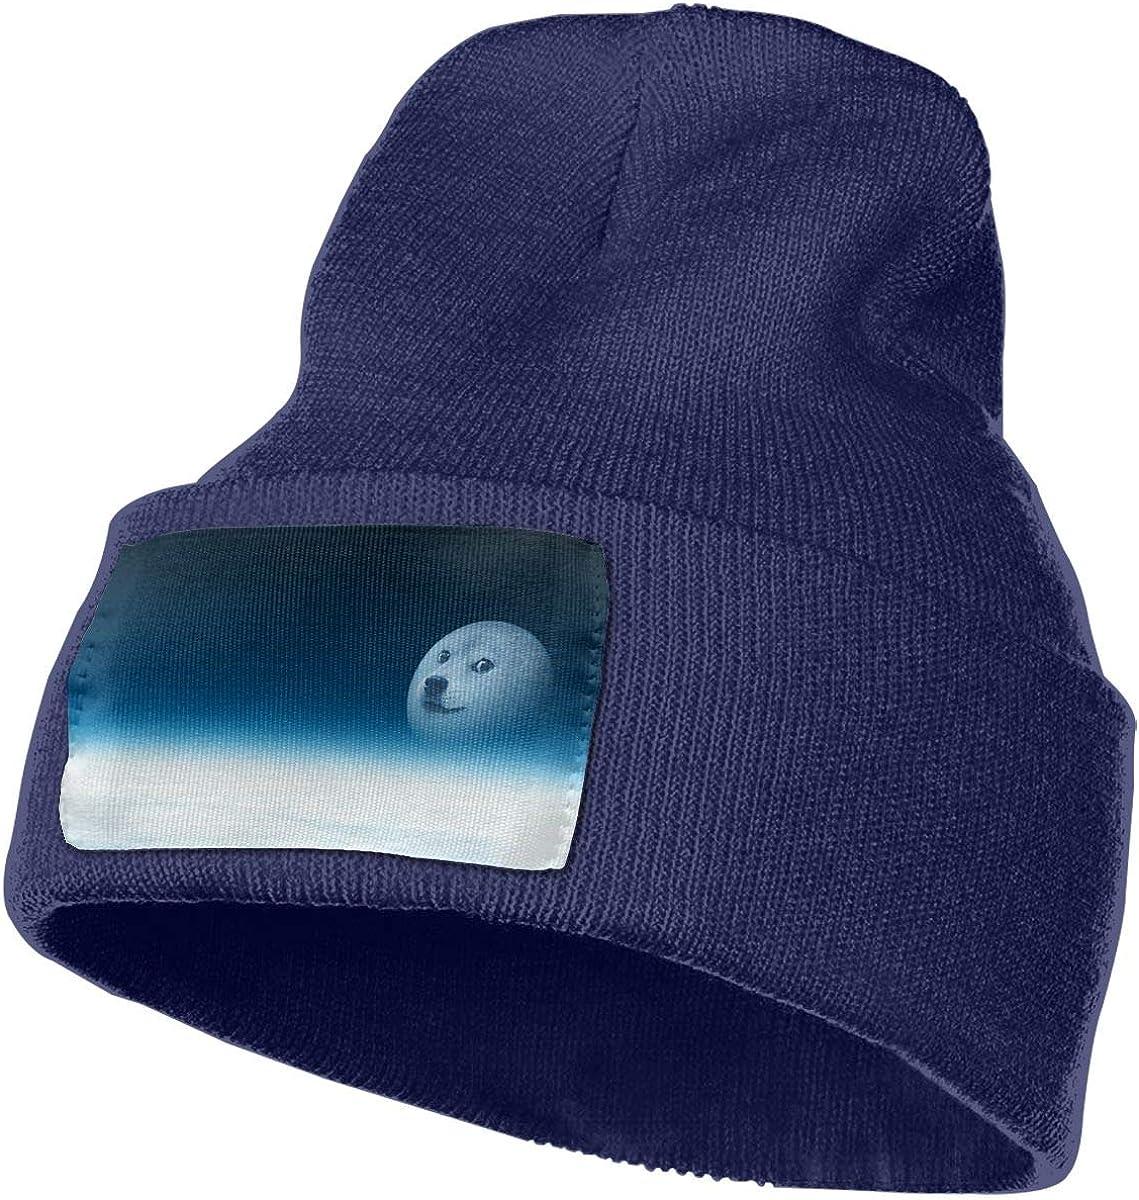 Yubb7E Doge Warm Knit Winter Solid Beanie Hat Unisex Skull Cap